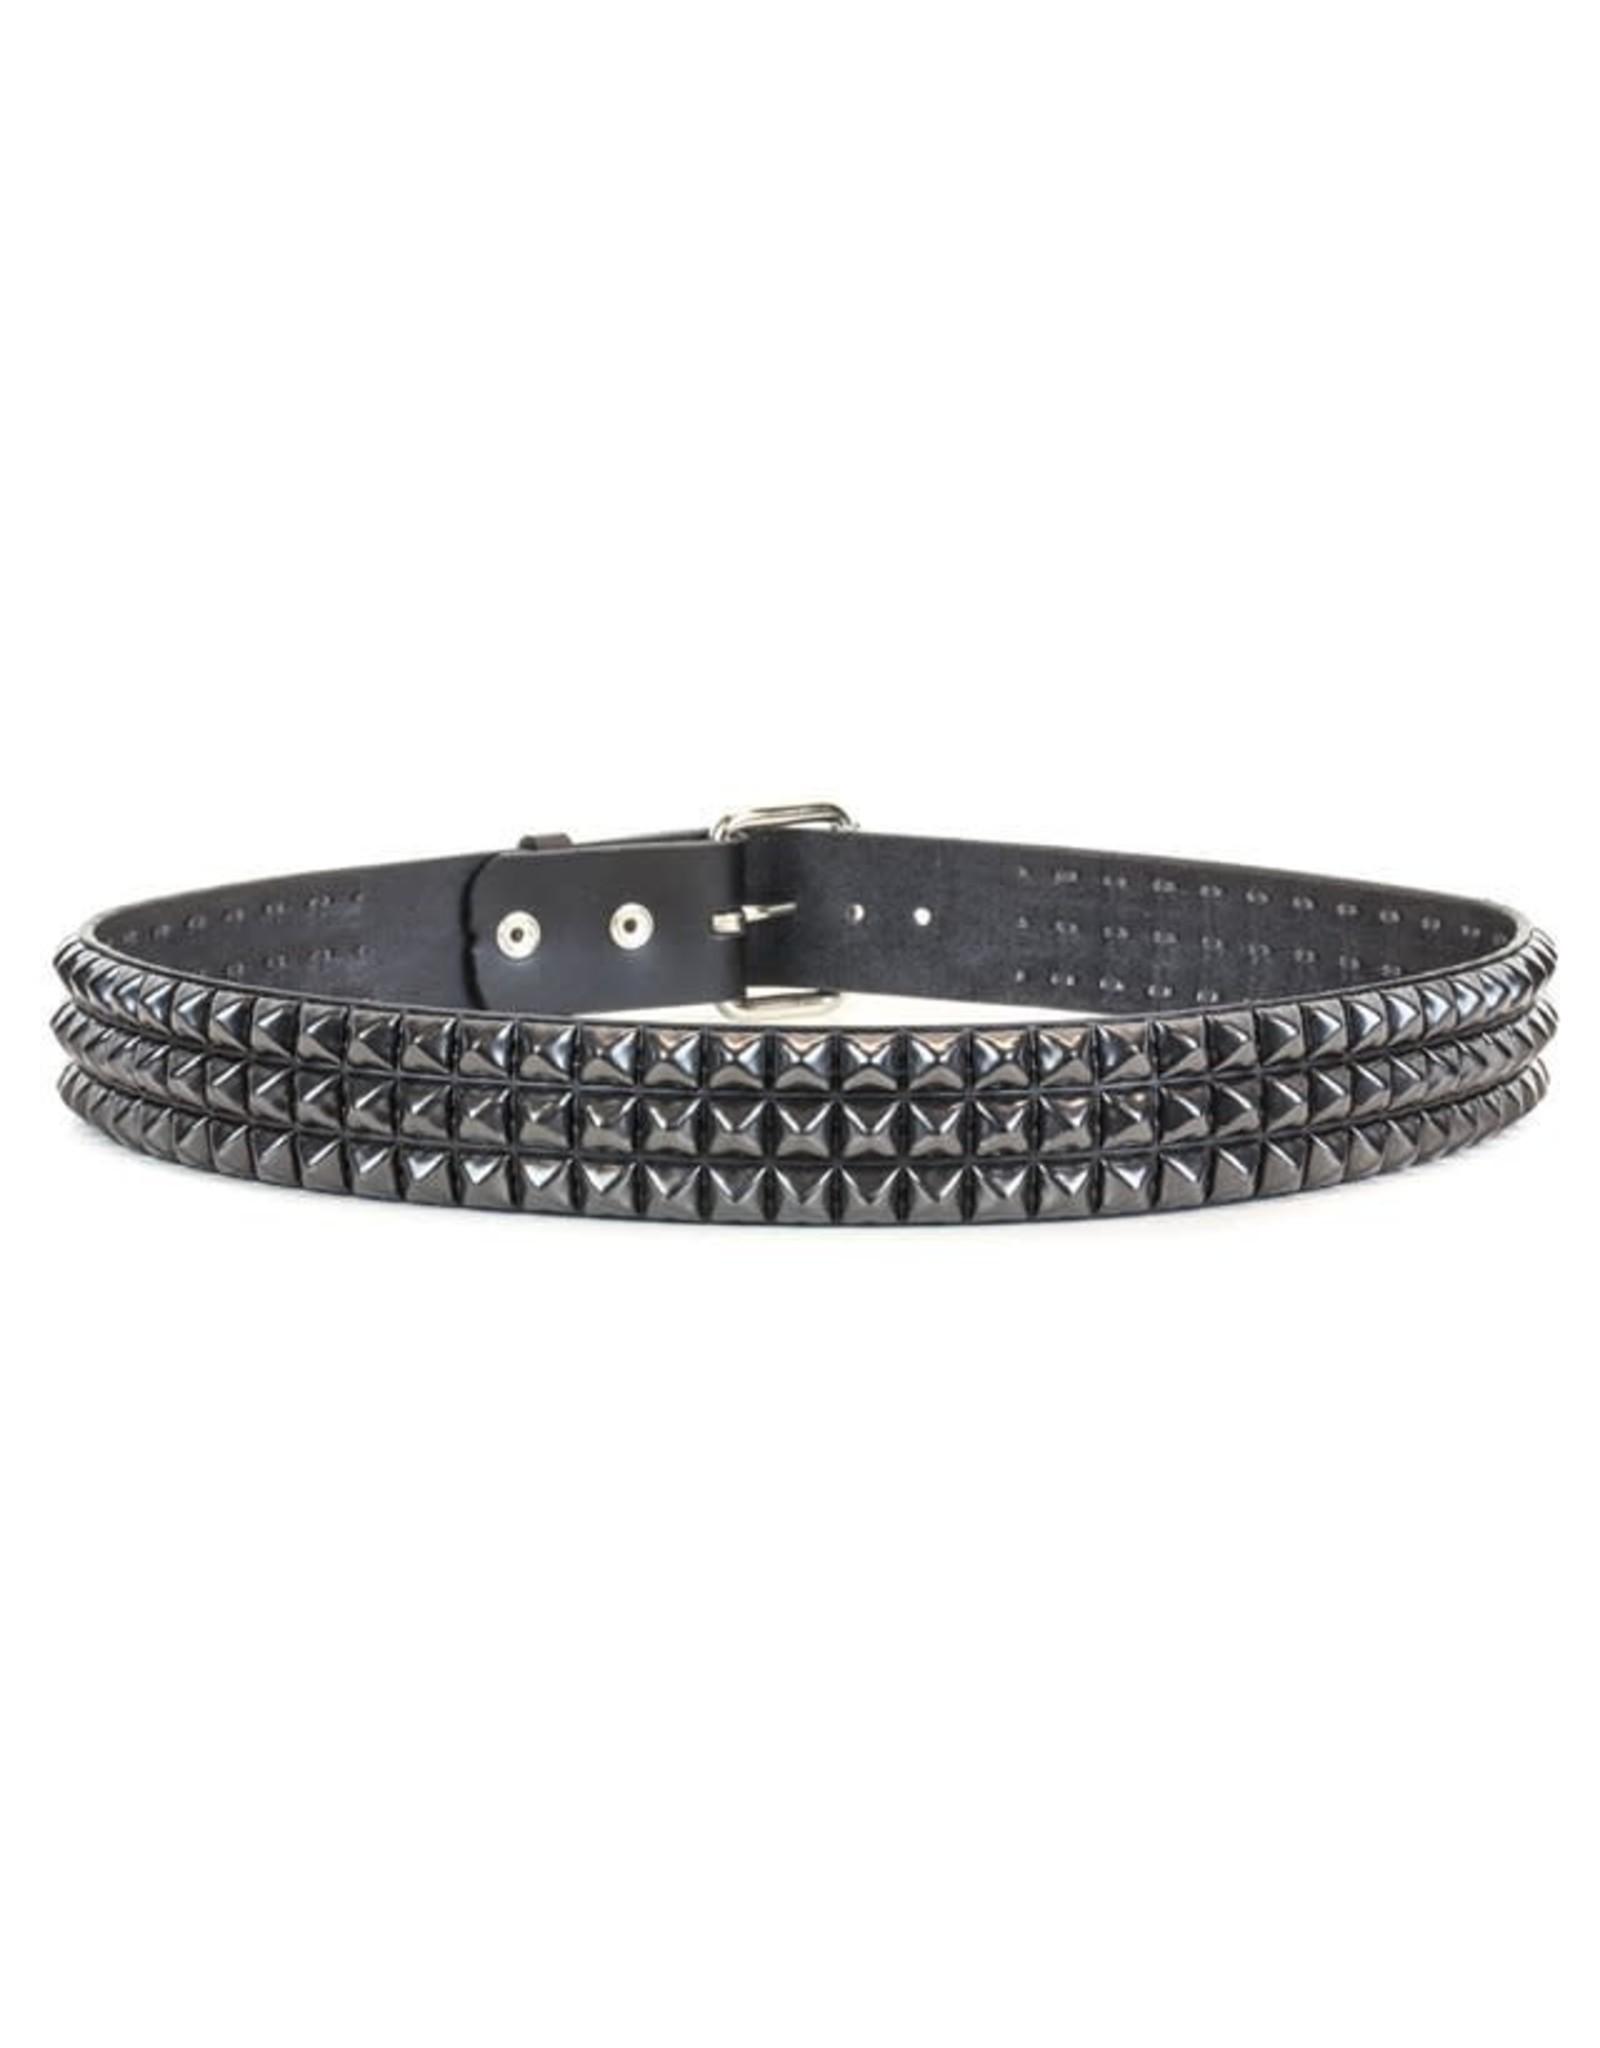 FUNKPLUS - 3 Rows/Black Studs Belt